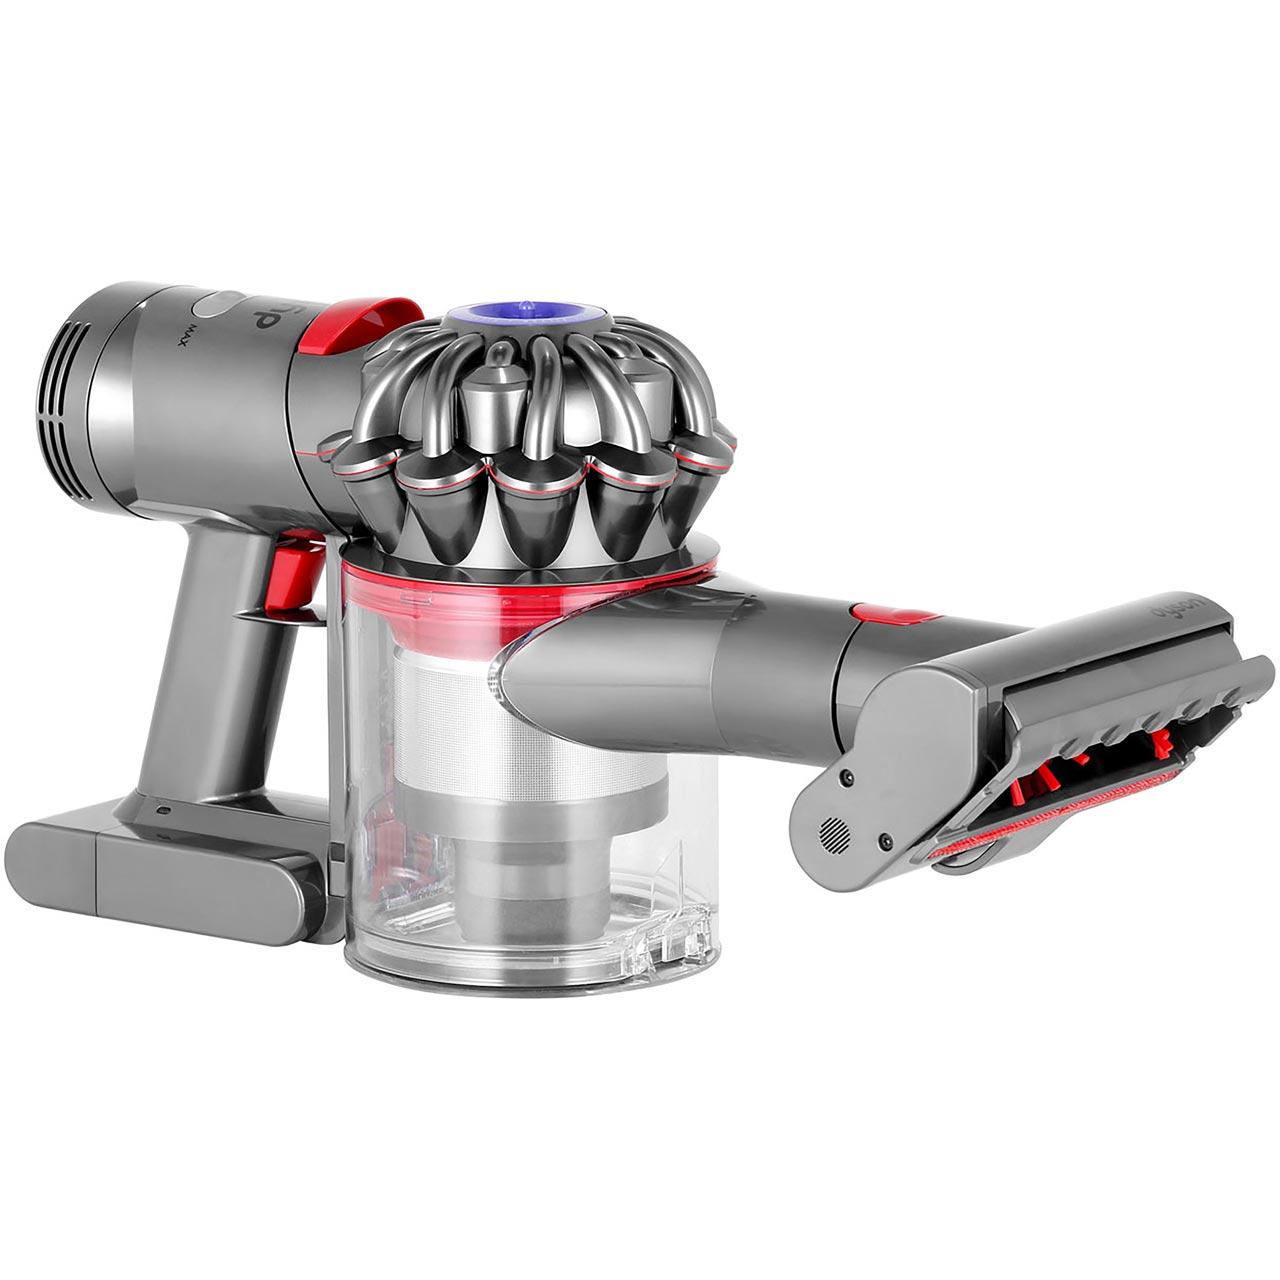 Dyson V7 Trigger Handheld Vacuum Cleaner New 5025155031575